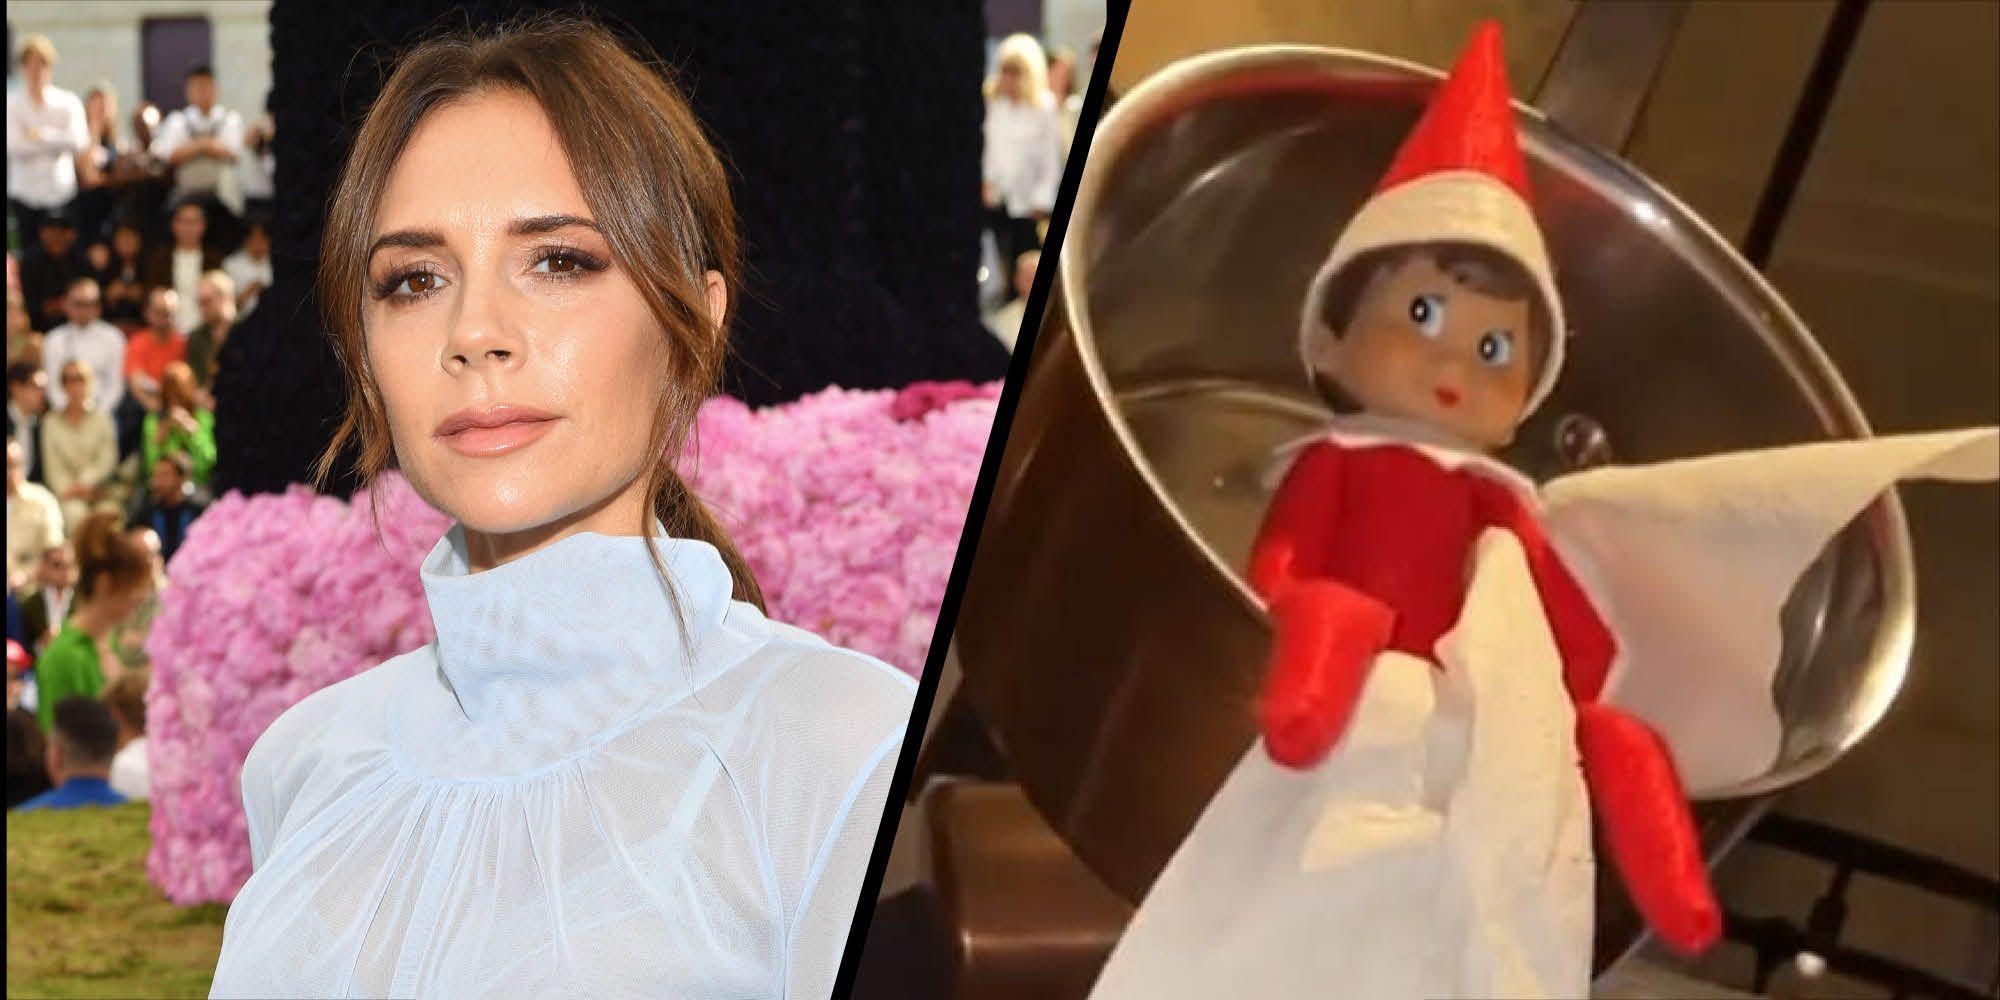 Victoria Beckham's Christmas decorations are truly unique